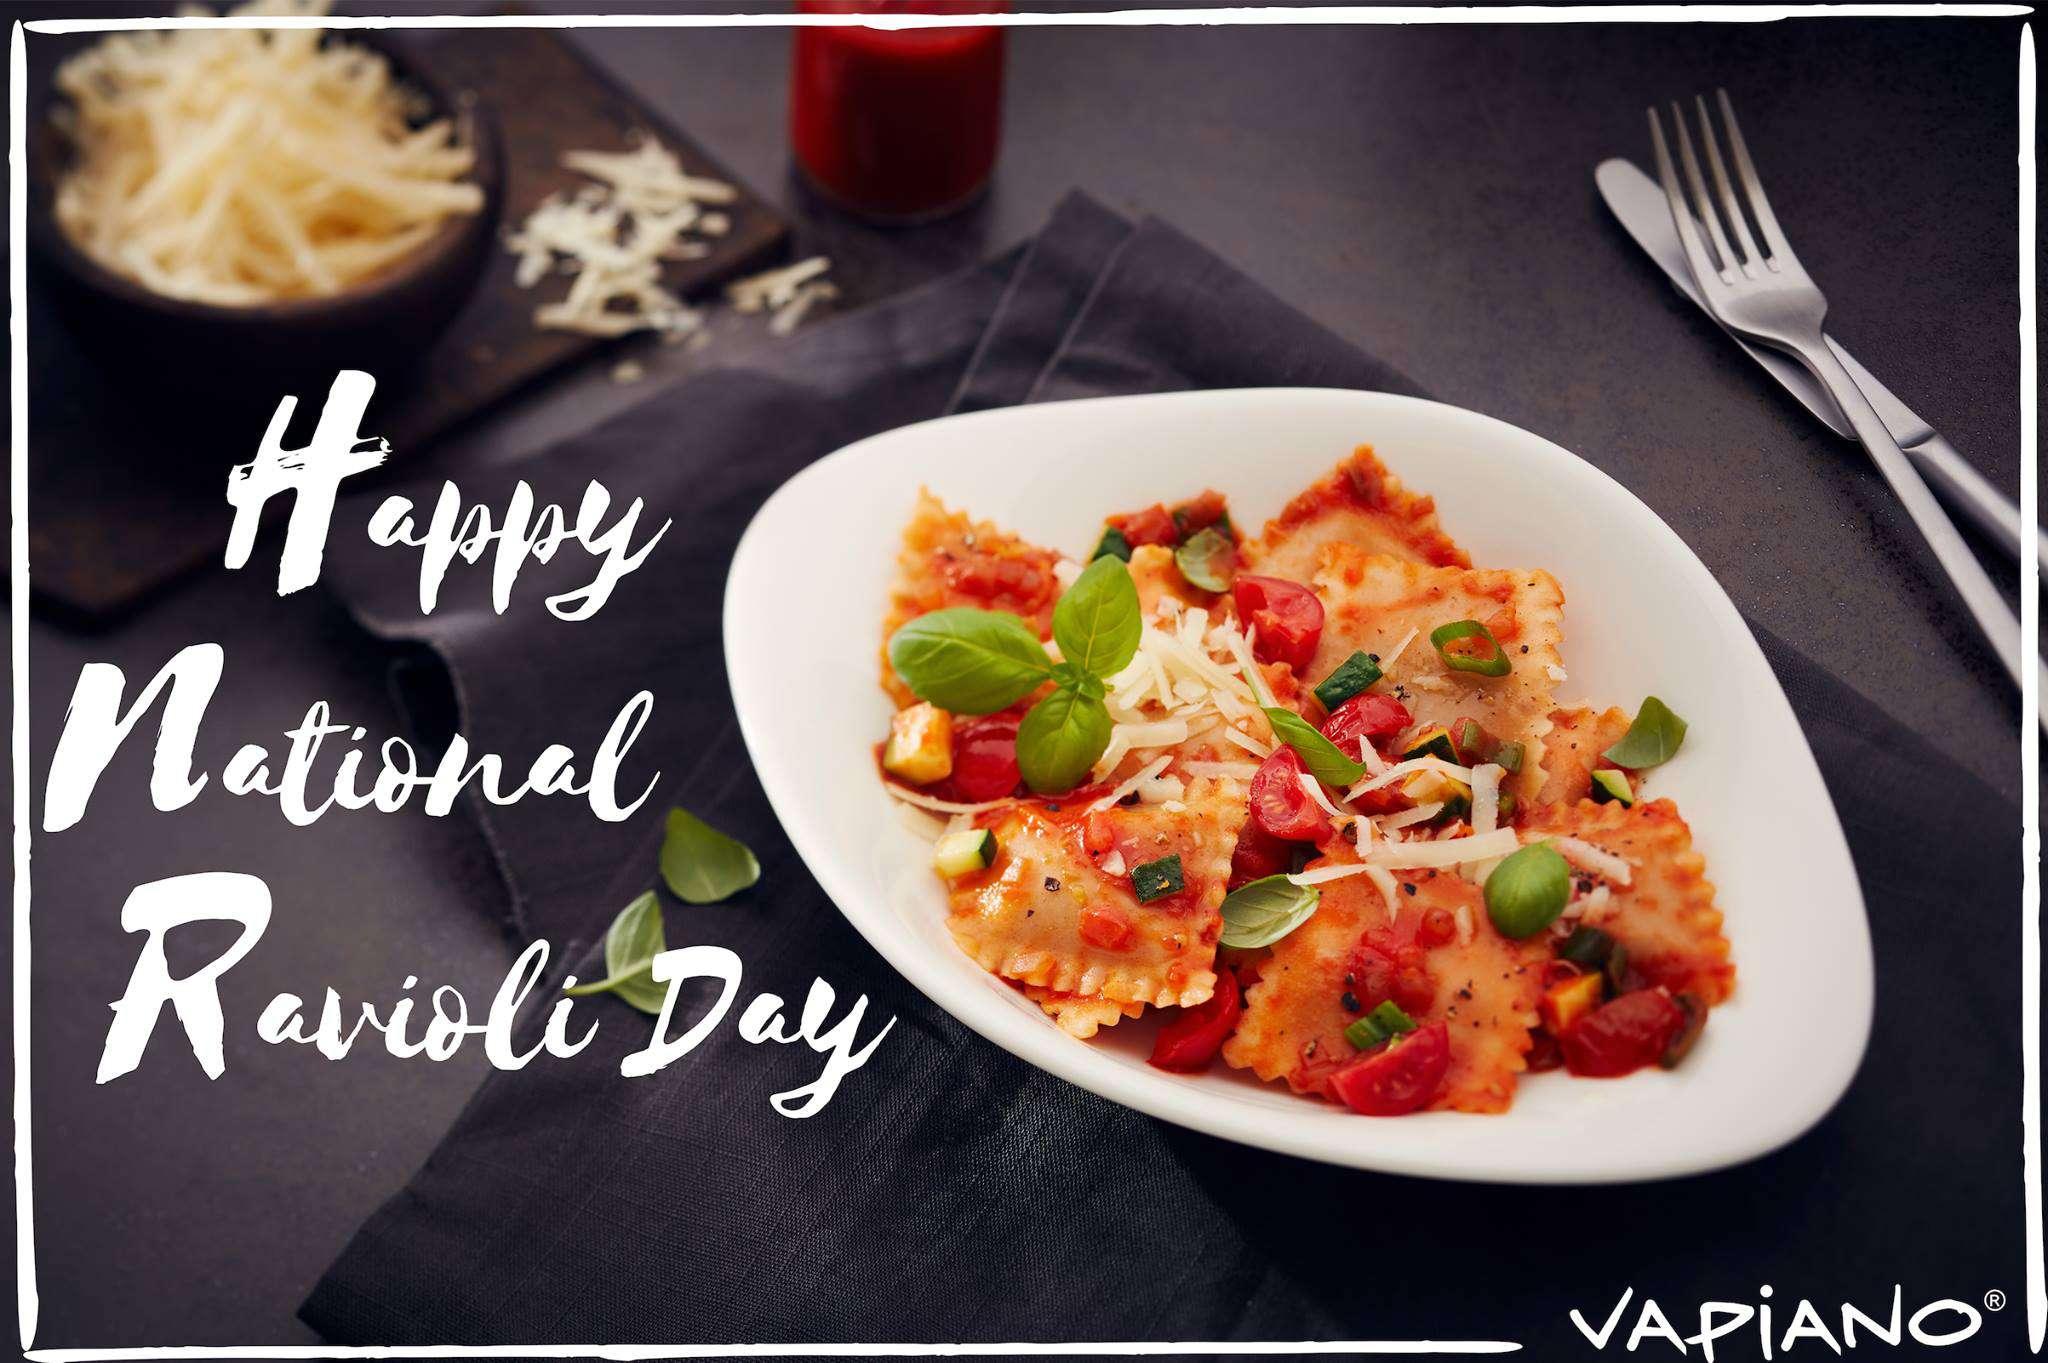 National Ravioli Day Wishes Unique Image